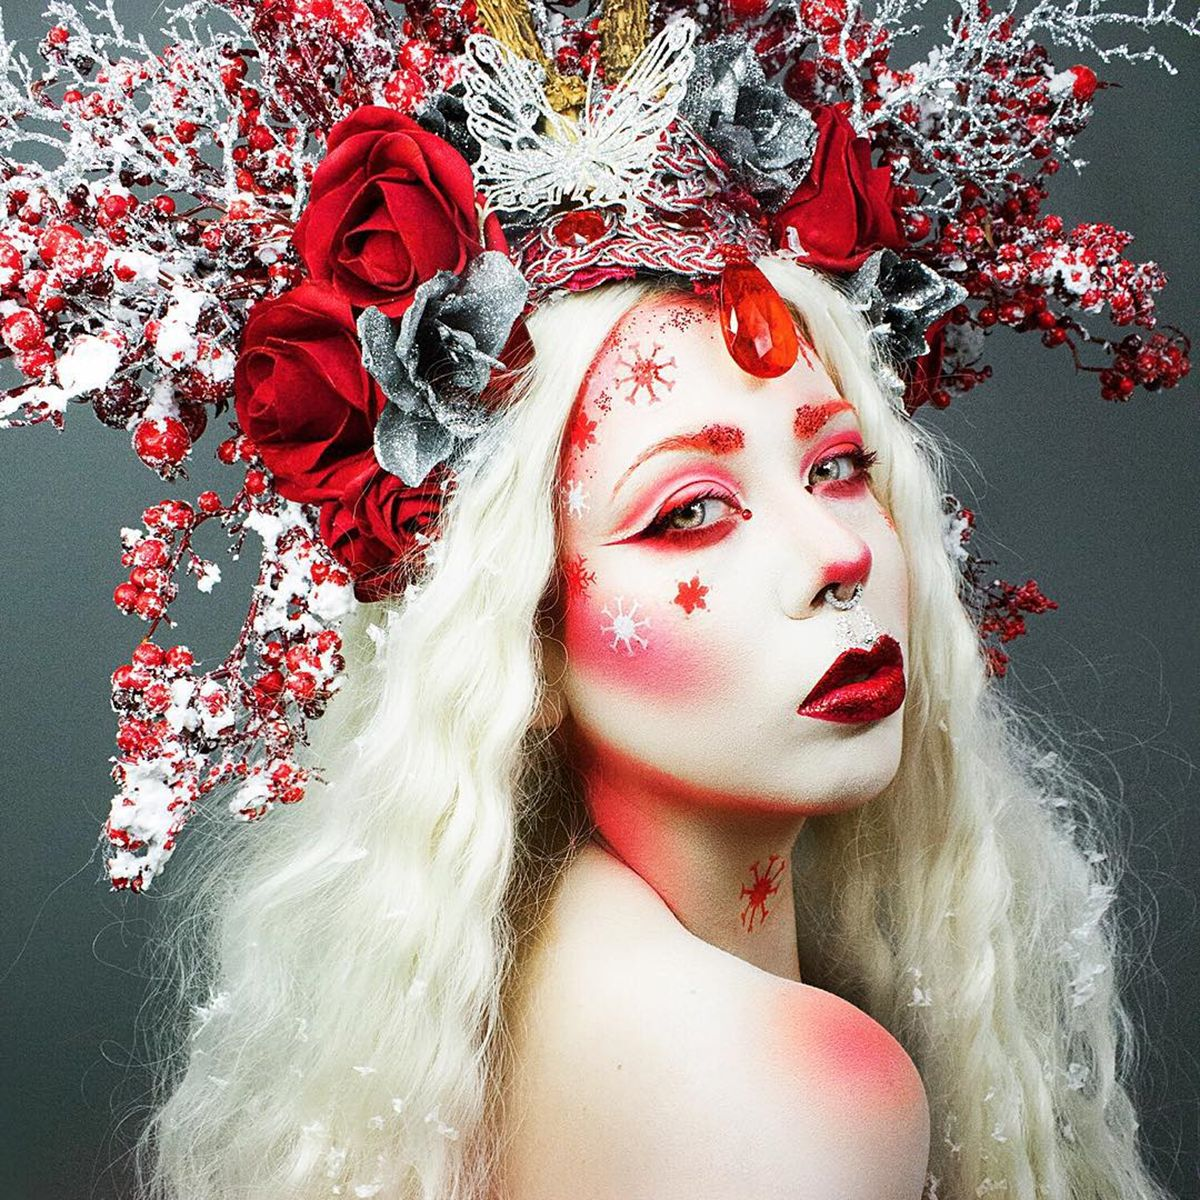 TWIGGYBRAINDEAD Red eyeshadow, Creepy makeup, Sugarpill